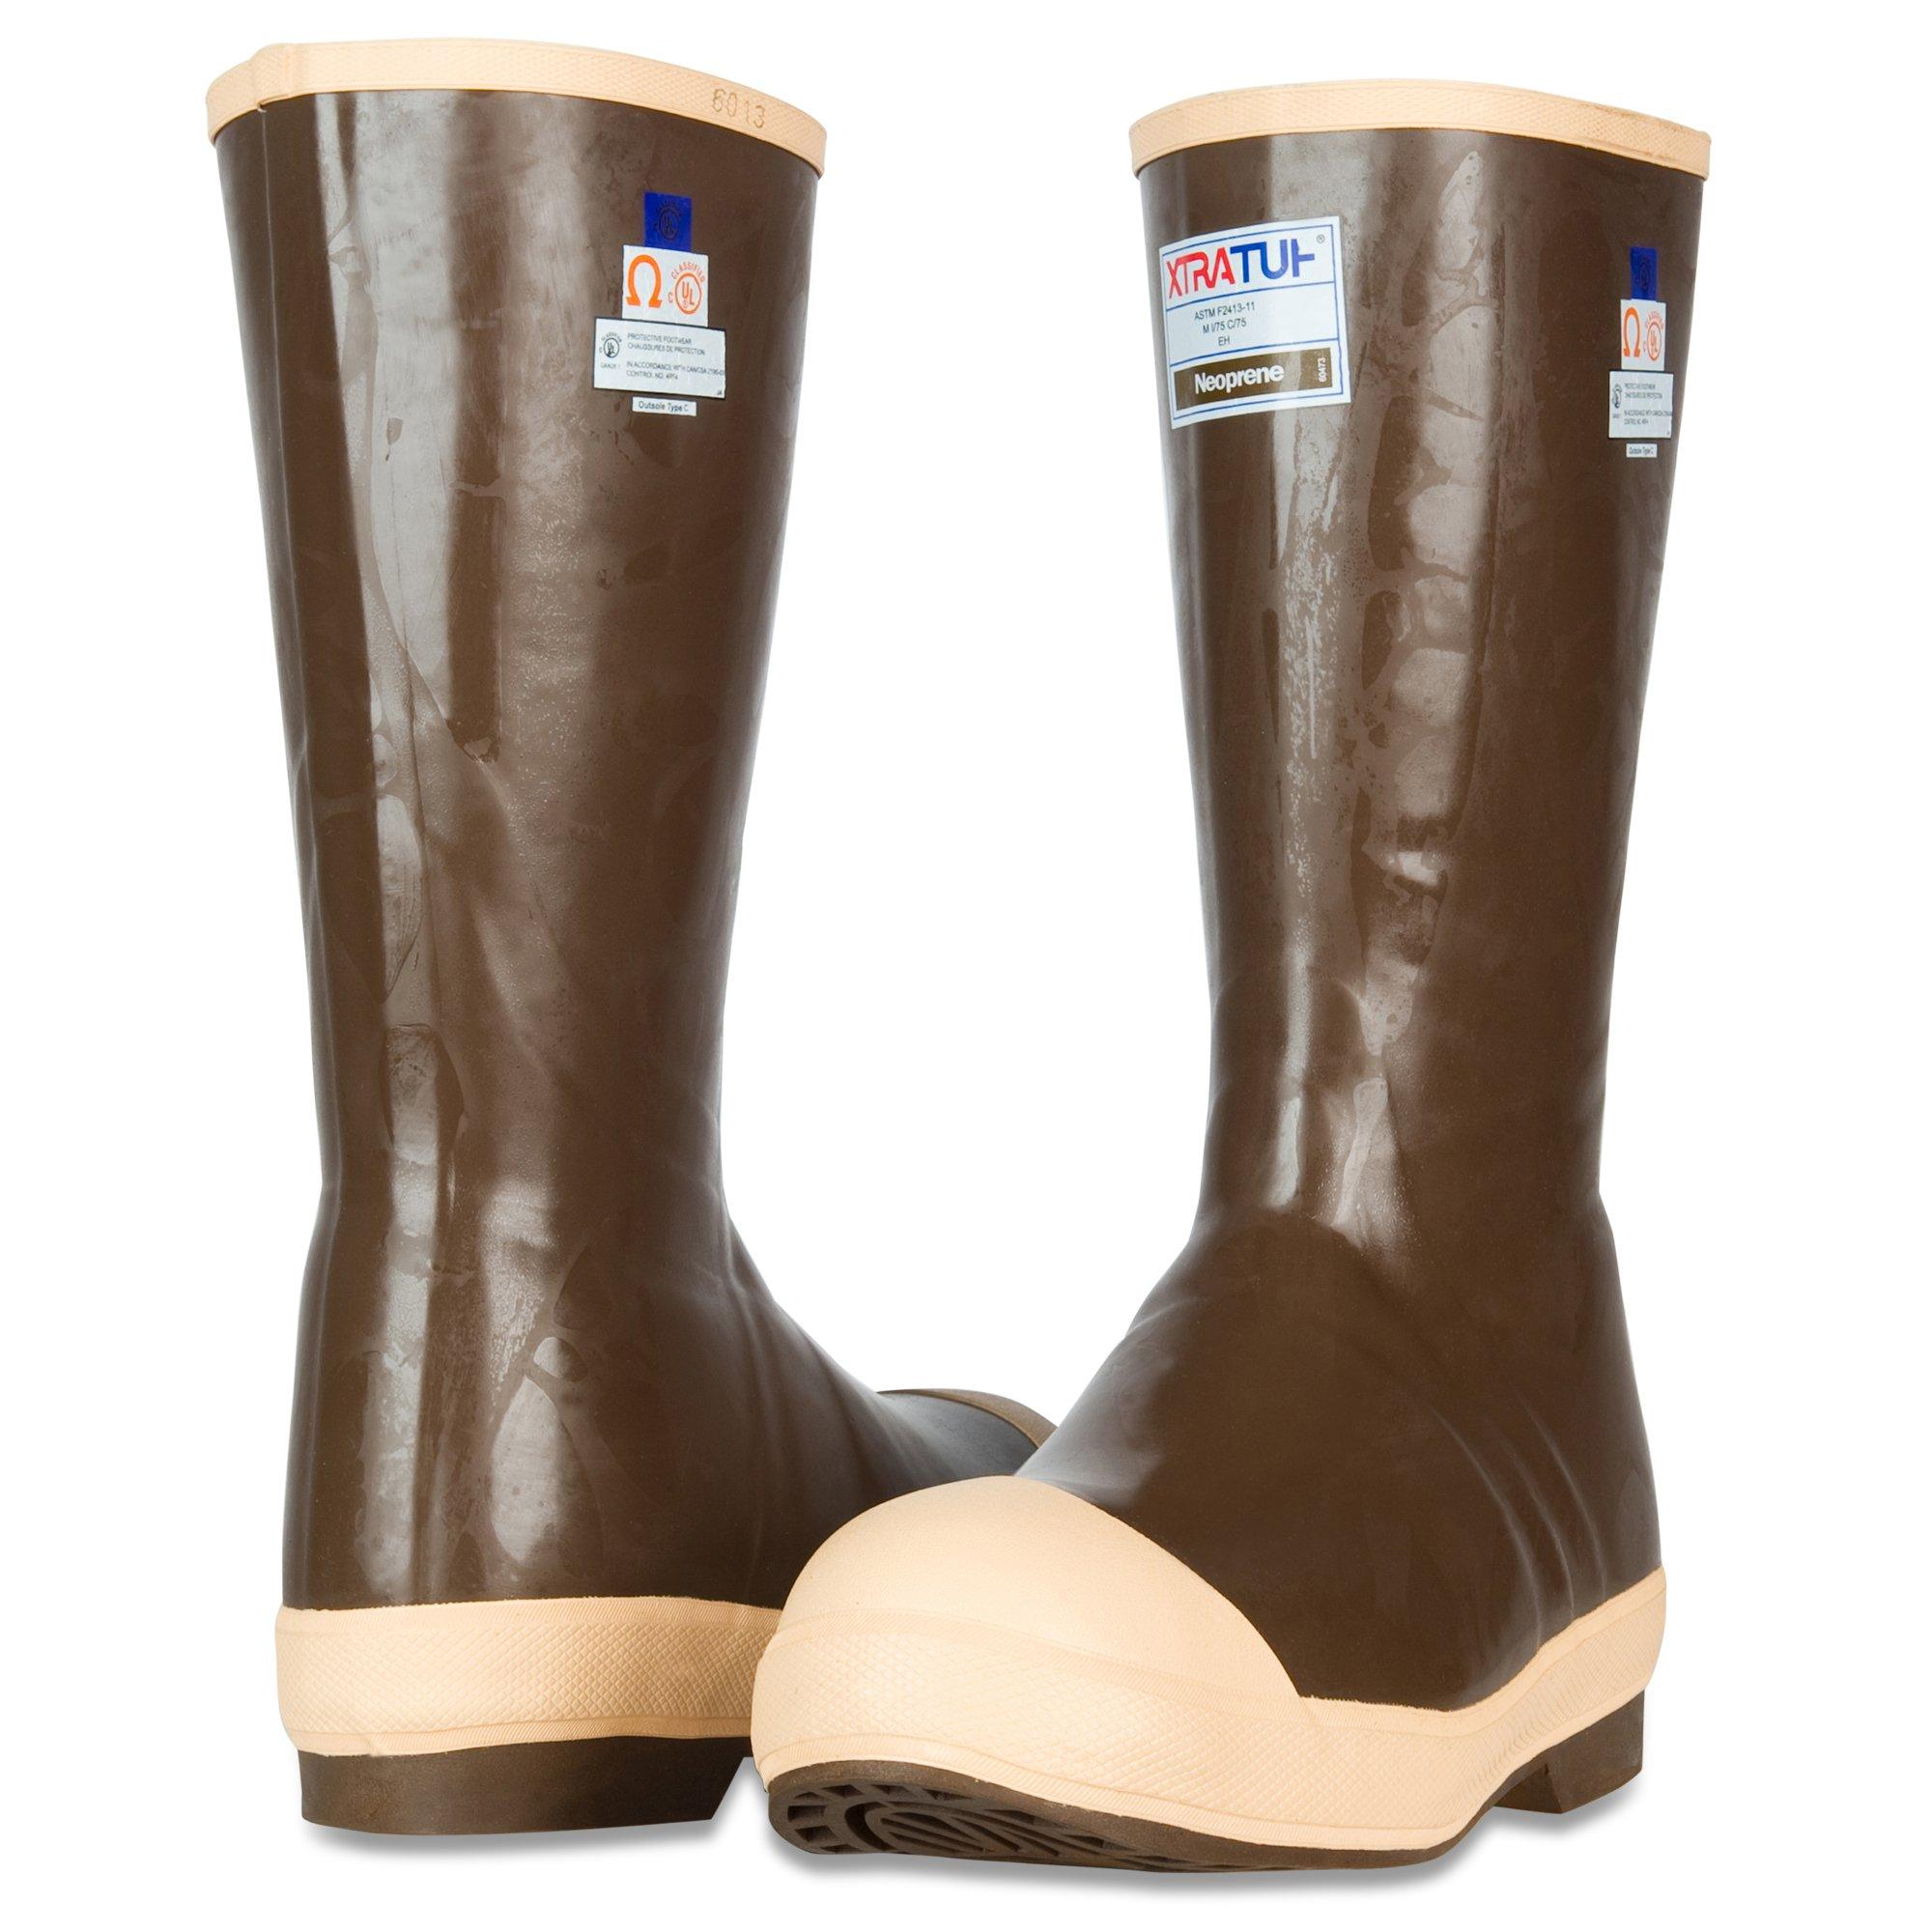 XTRATUF Legacy Series 15'' Neoprene Steel Toe Insulated Men's Fishing Boots, Copper & Tan (22273G) by Xtratuf (Image #6)